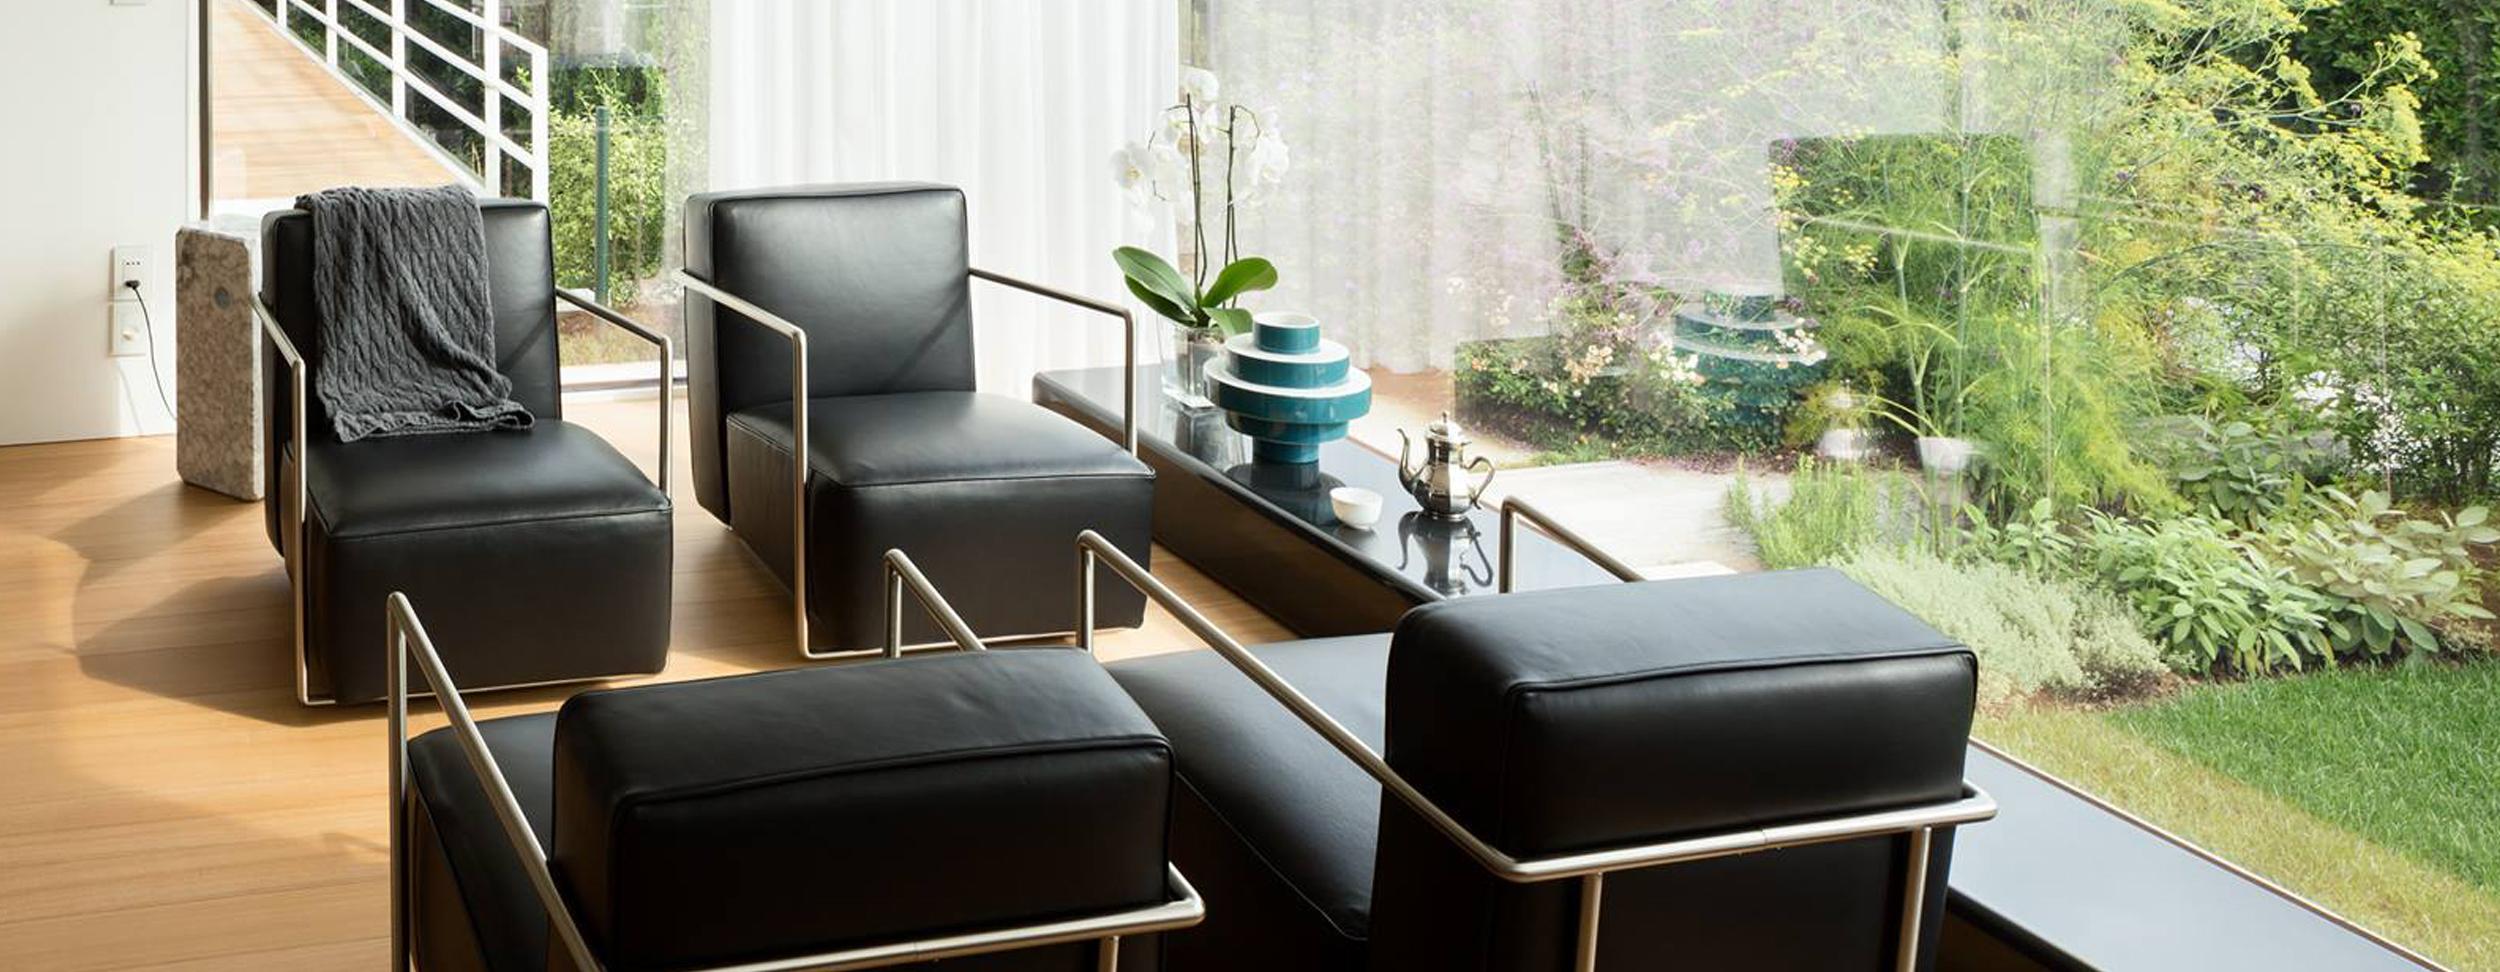 Designer Lounge Chairs & Armchairs Sydney & Melbourne ...